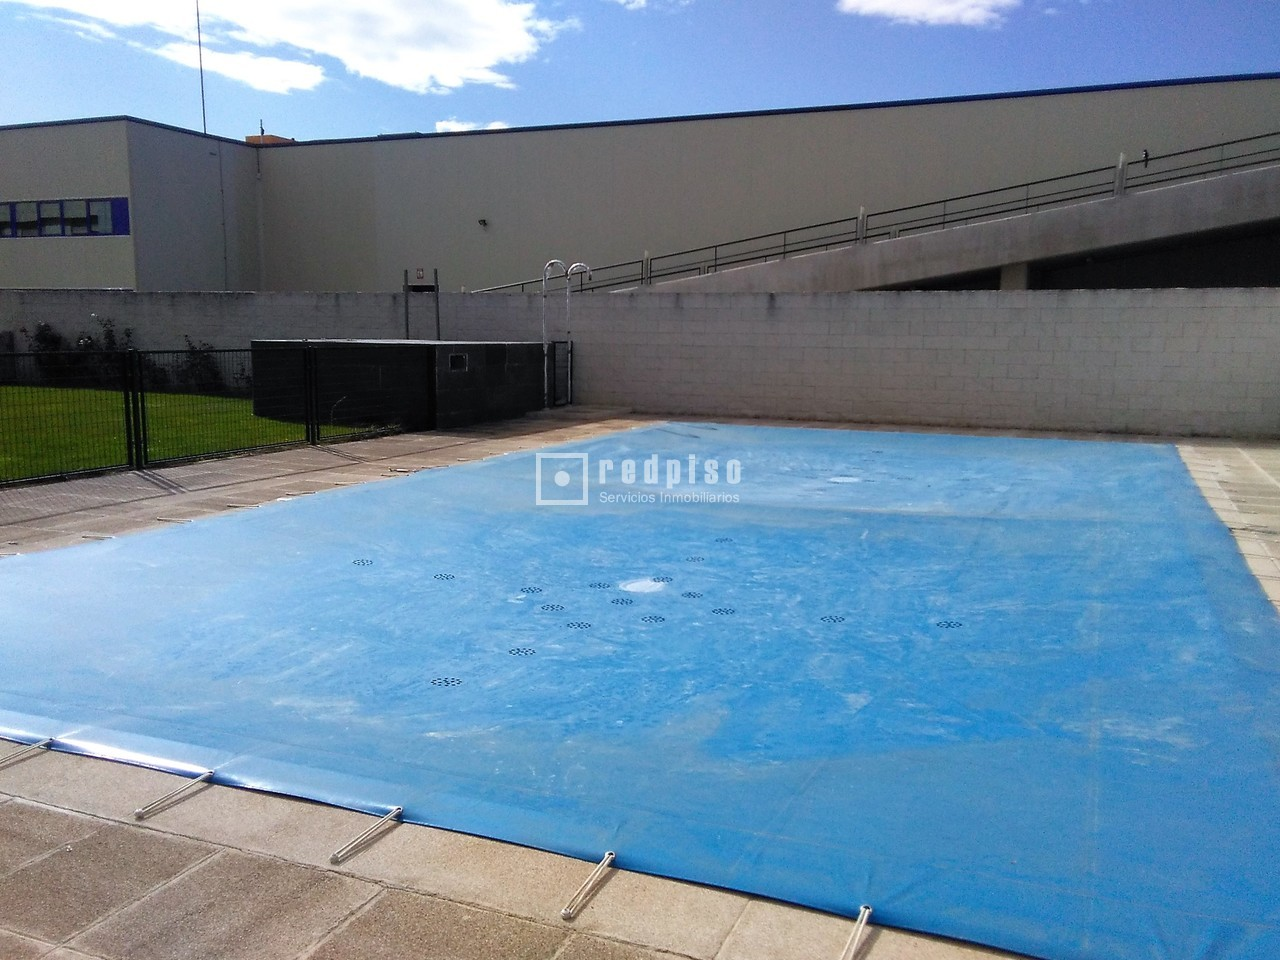 Piscinas tres cantos amazing deporte online with piscinas for Piscina islas tres cantos